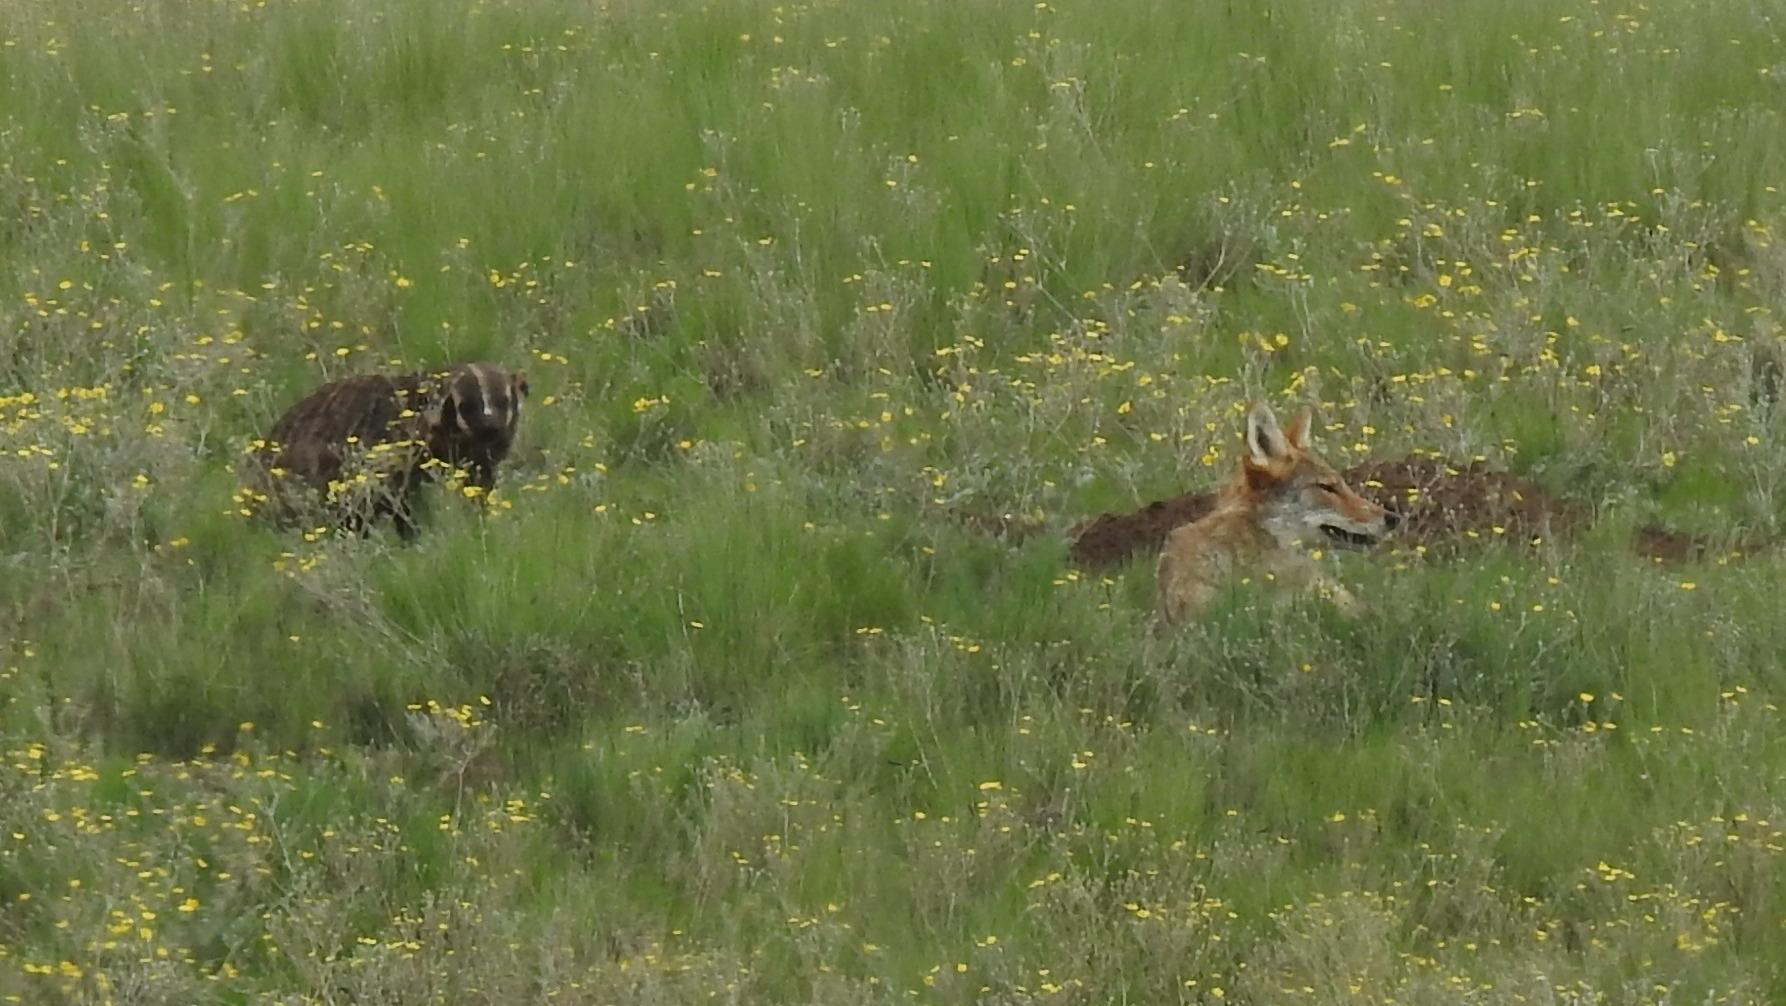 Badger and Coyote hunting together, Valles Caldera Nat. Pres., NM